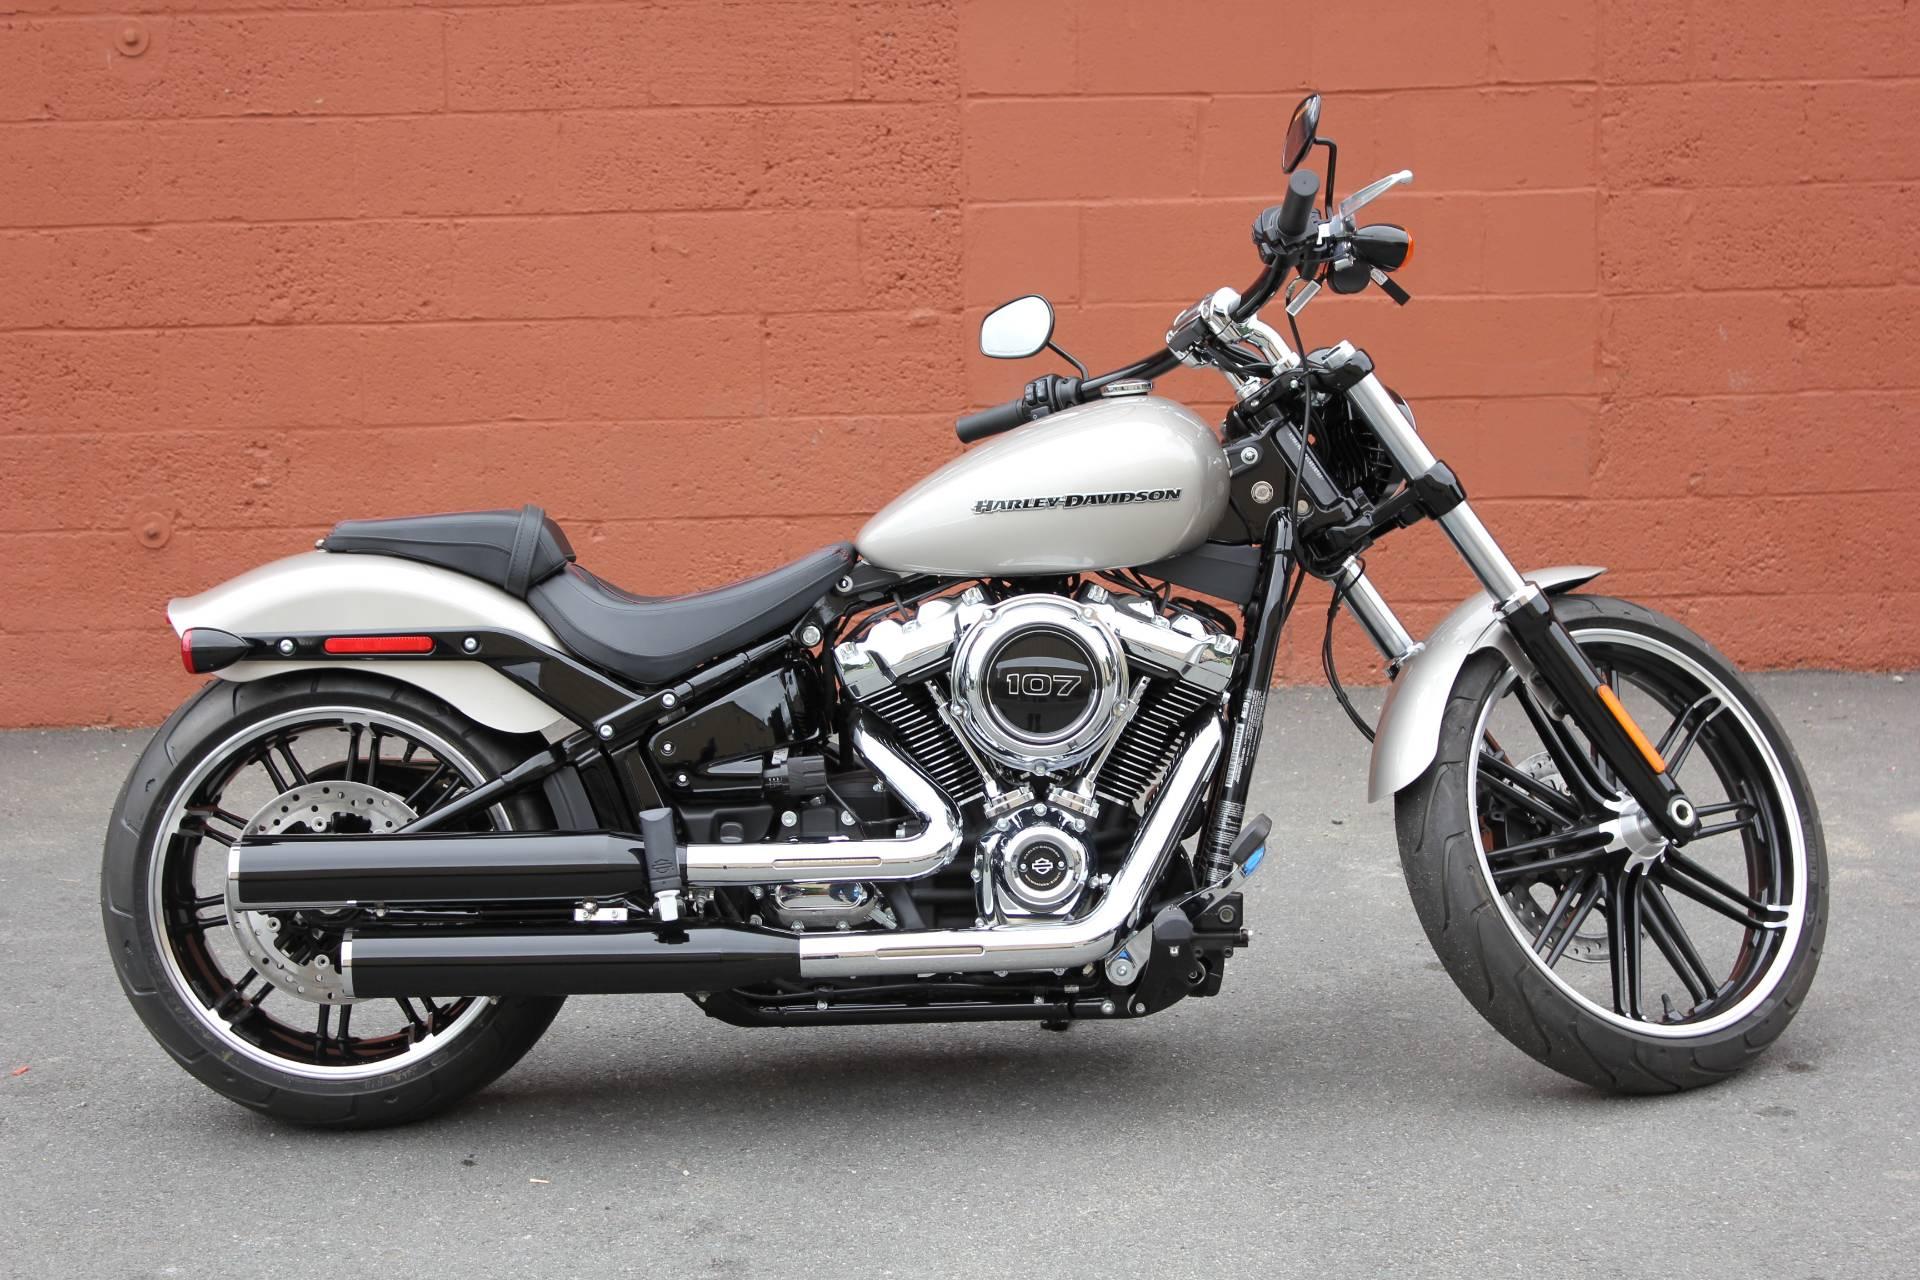 Harley Davidson 0 99 Financing